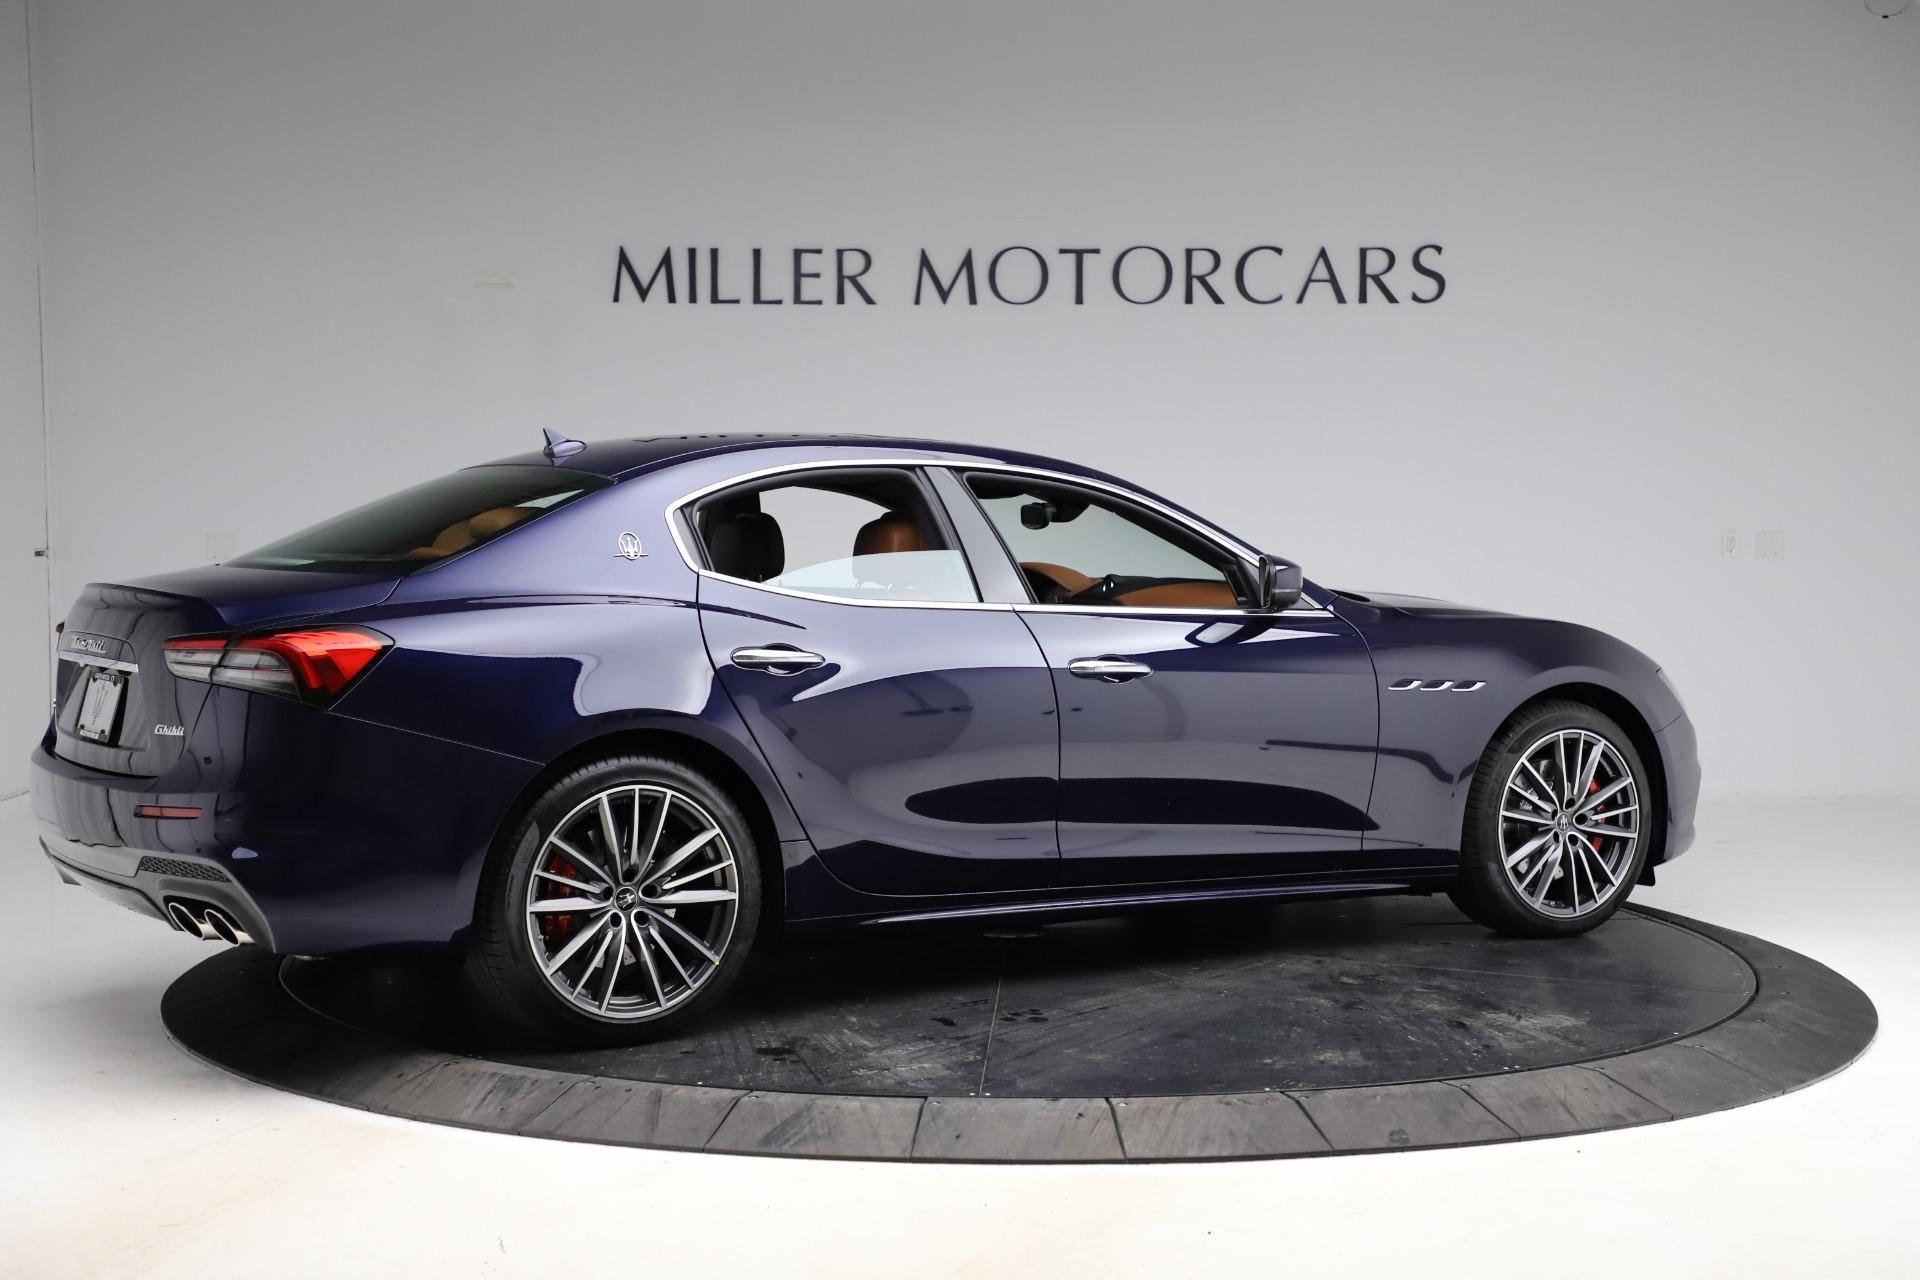 New 2021 Maserati Ghibli S Q4 For Sale ($90,925) | Miller ...